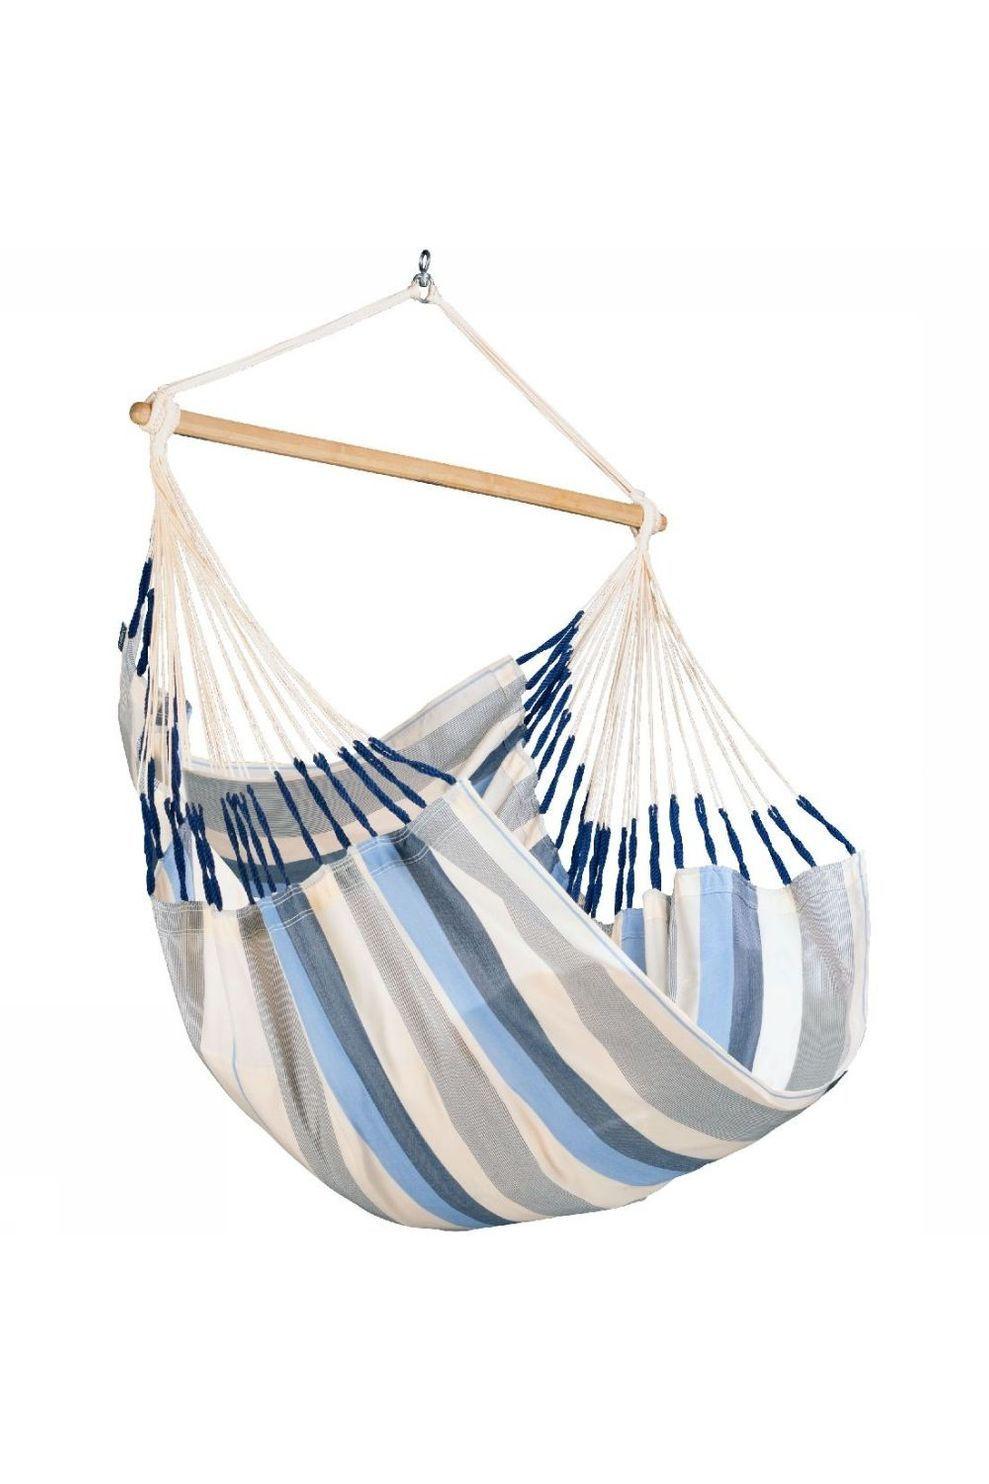 La Siesta Hangmat Domingo Hammock Chair - Blauw/Wit